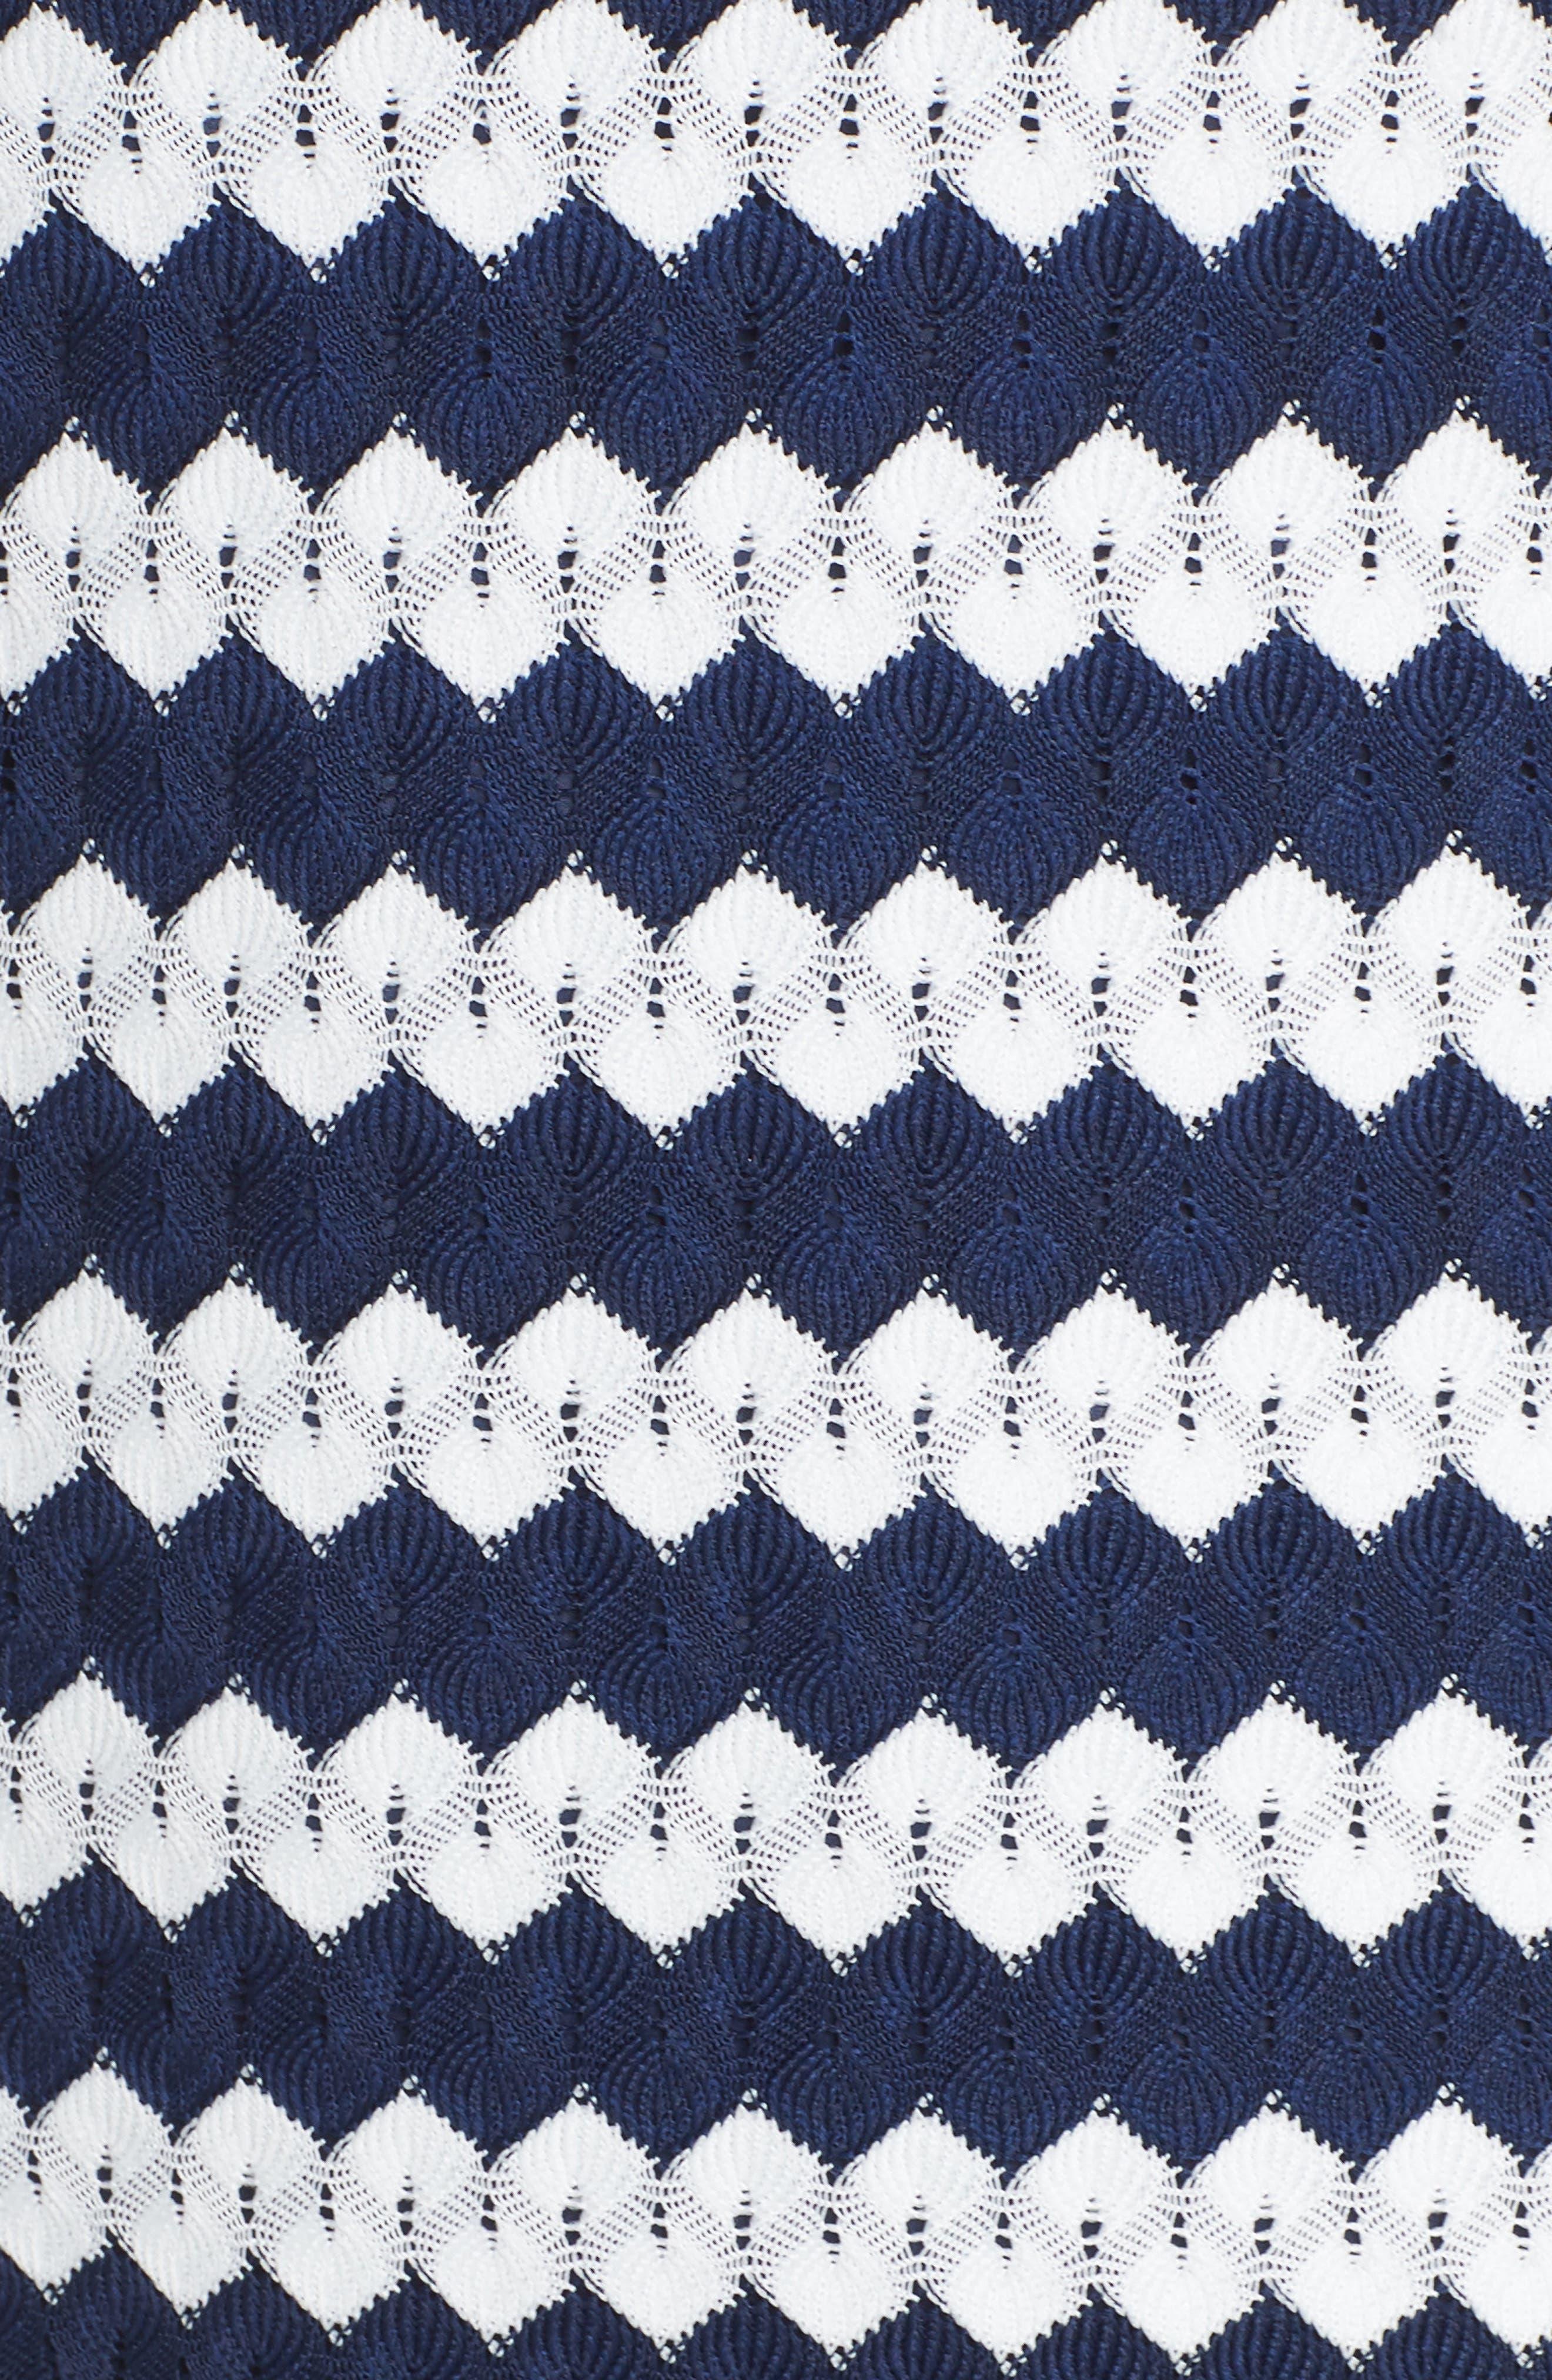 Zigzag Halter Shift Dress,                             Alternate thumbnail 6, color,                             Indigo/ Whitewash